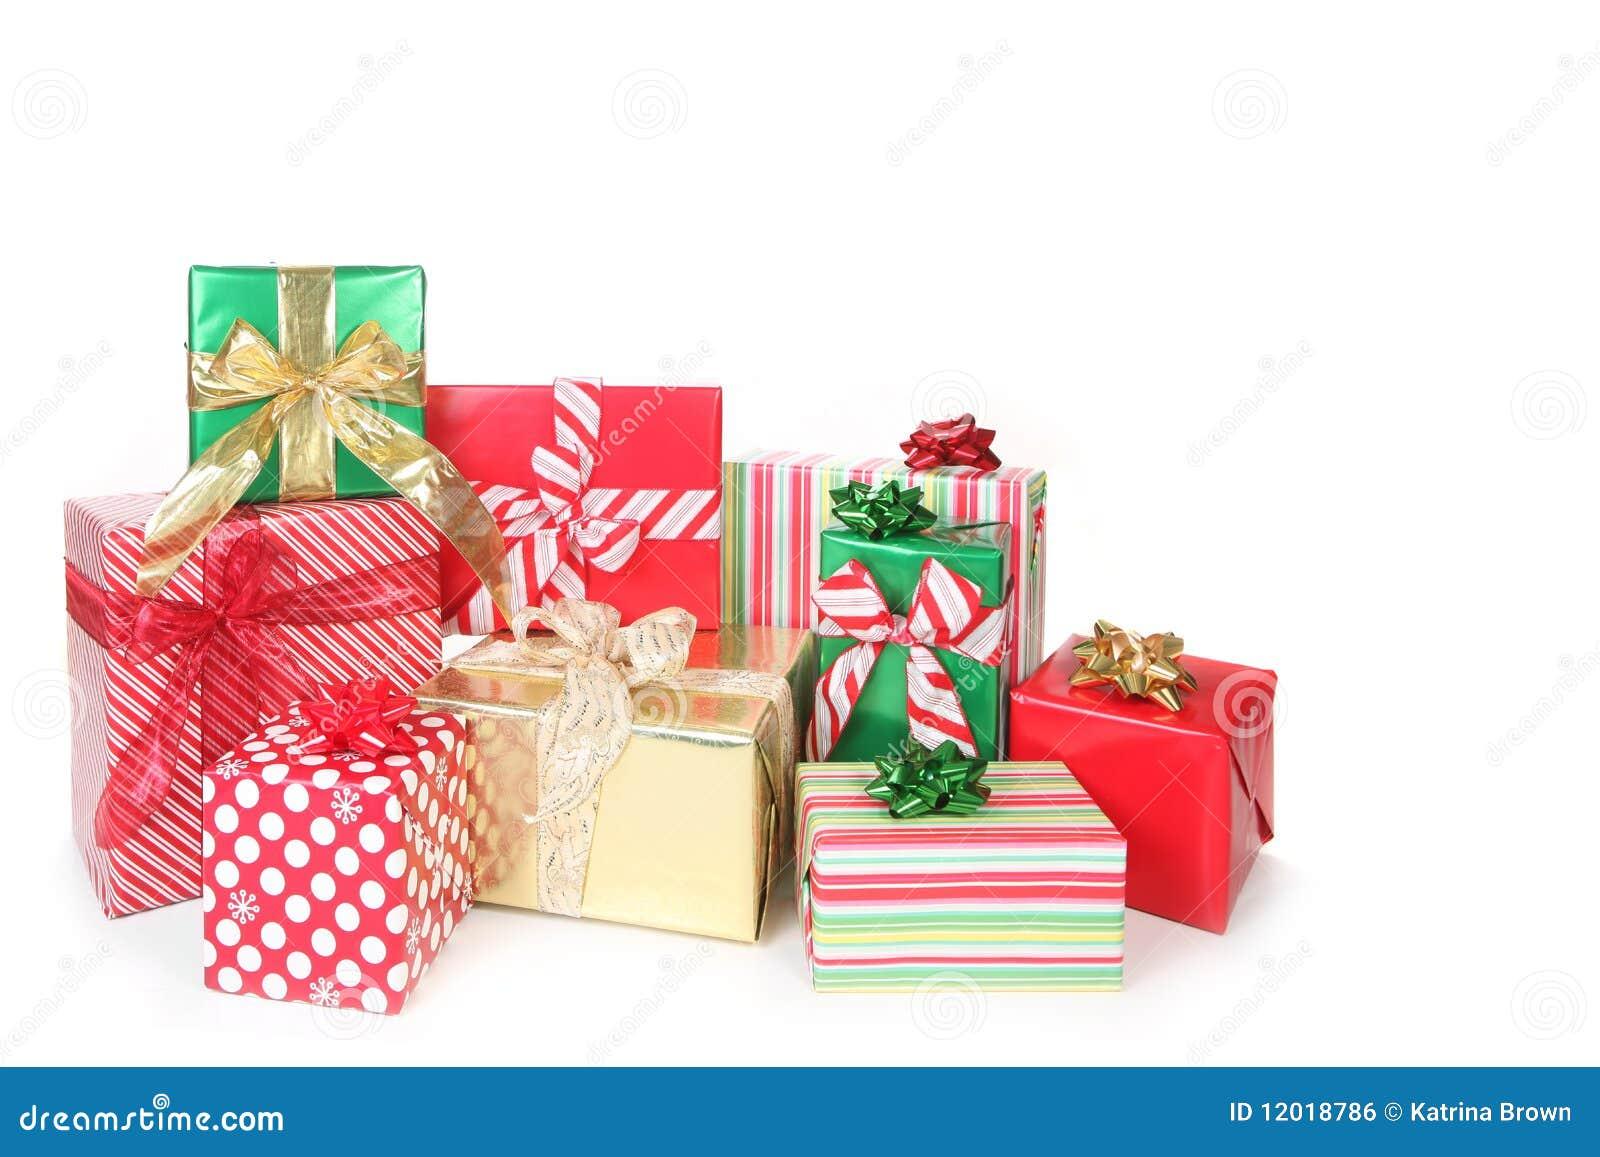 Christmas Soap Gift |Pretty Christmas Presents